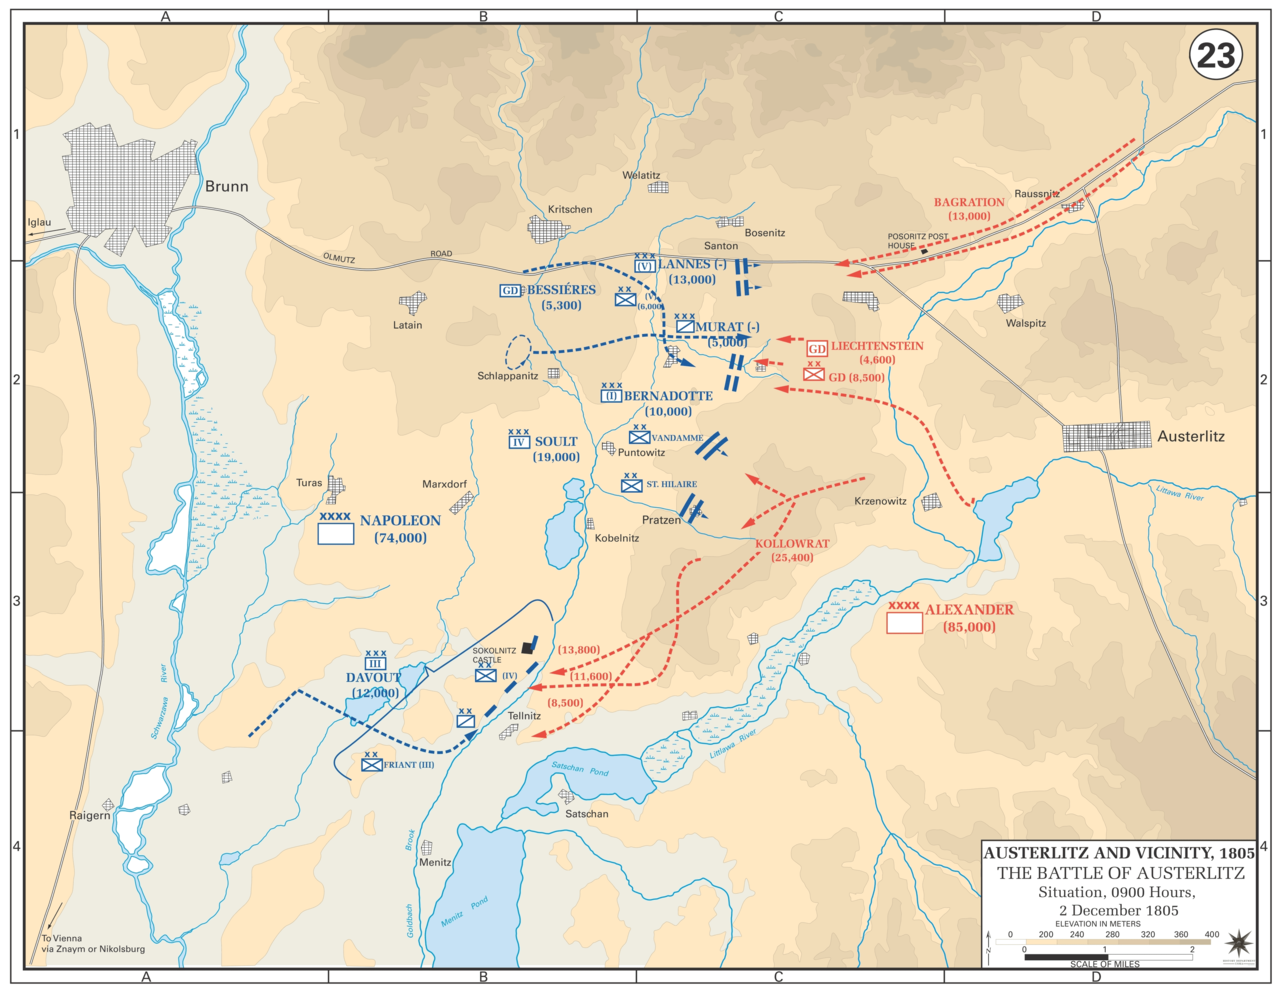 Battle of Austerlitz Map